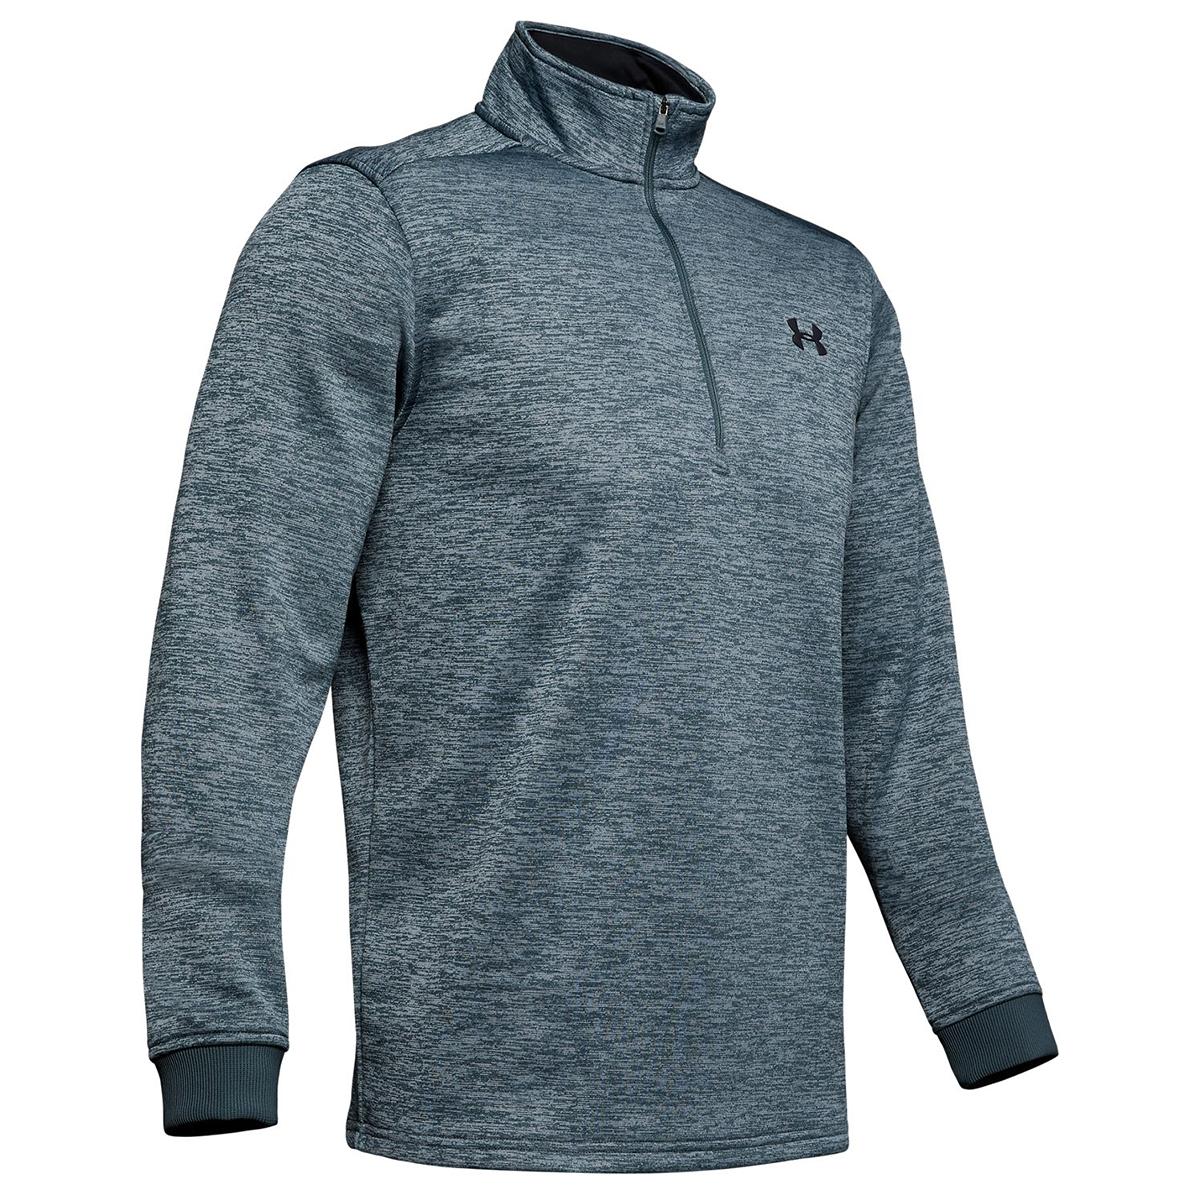 Under Armour Men's Armour Fleece Half Zip Pullover - Black, XL